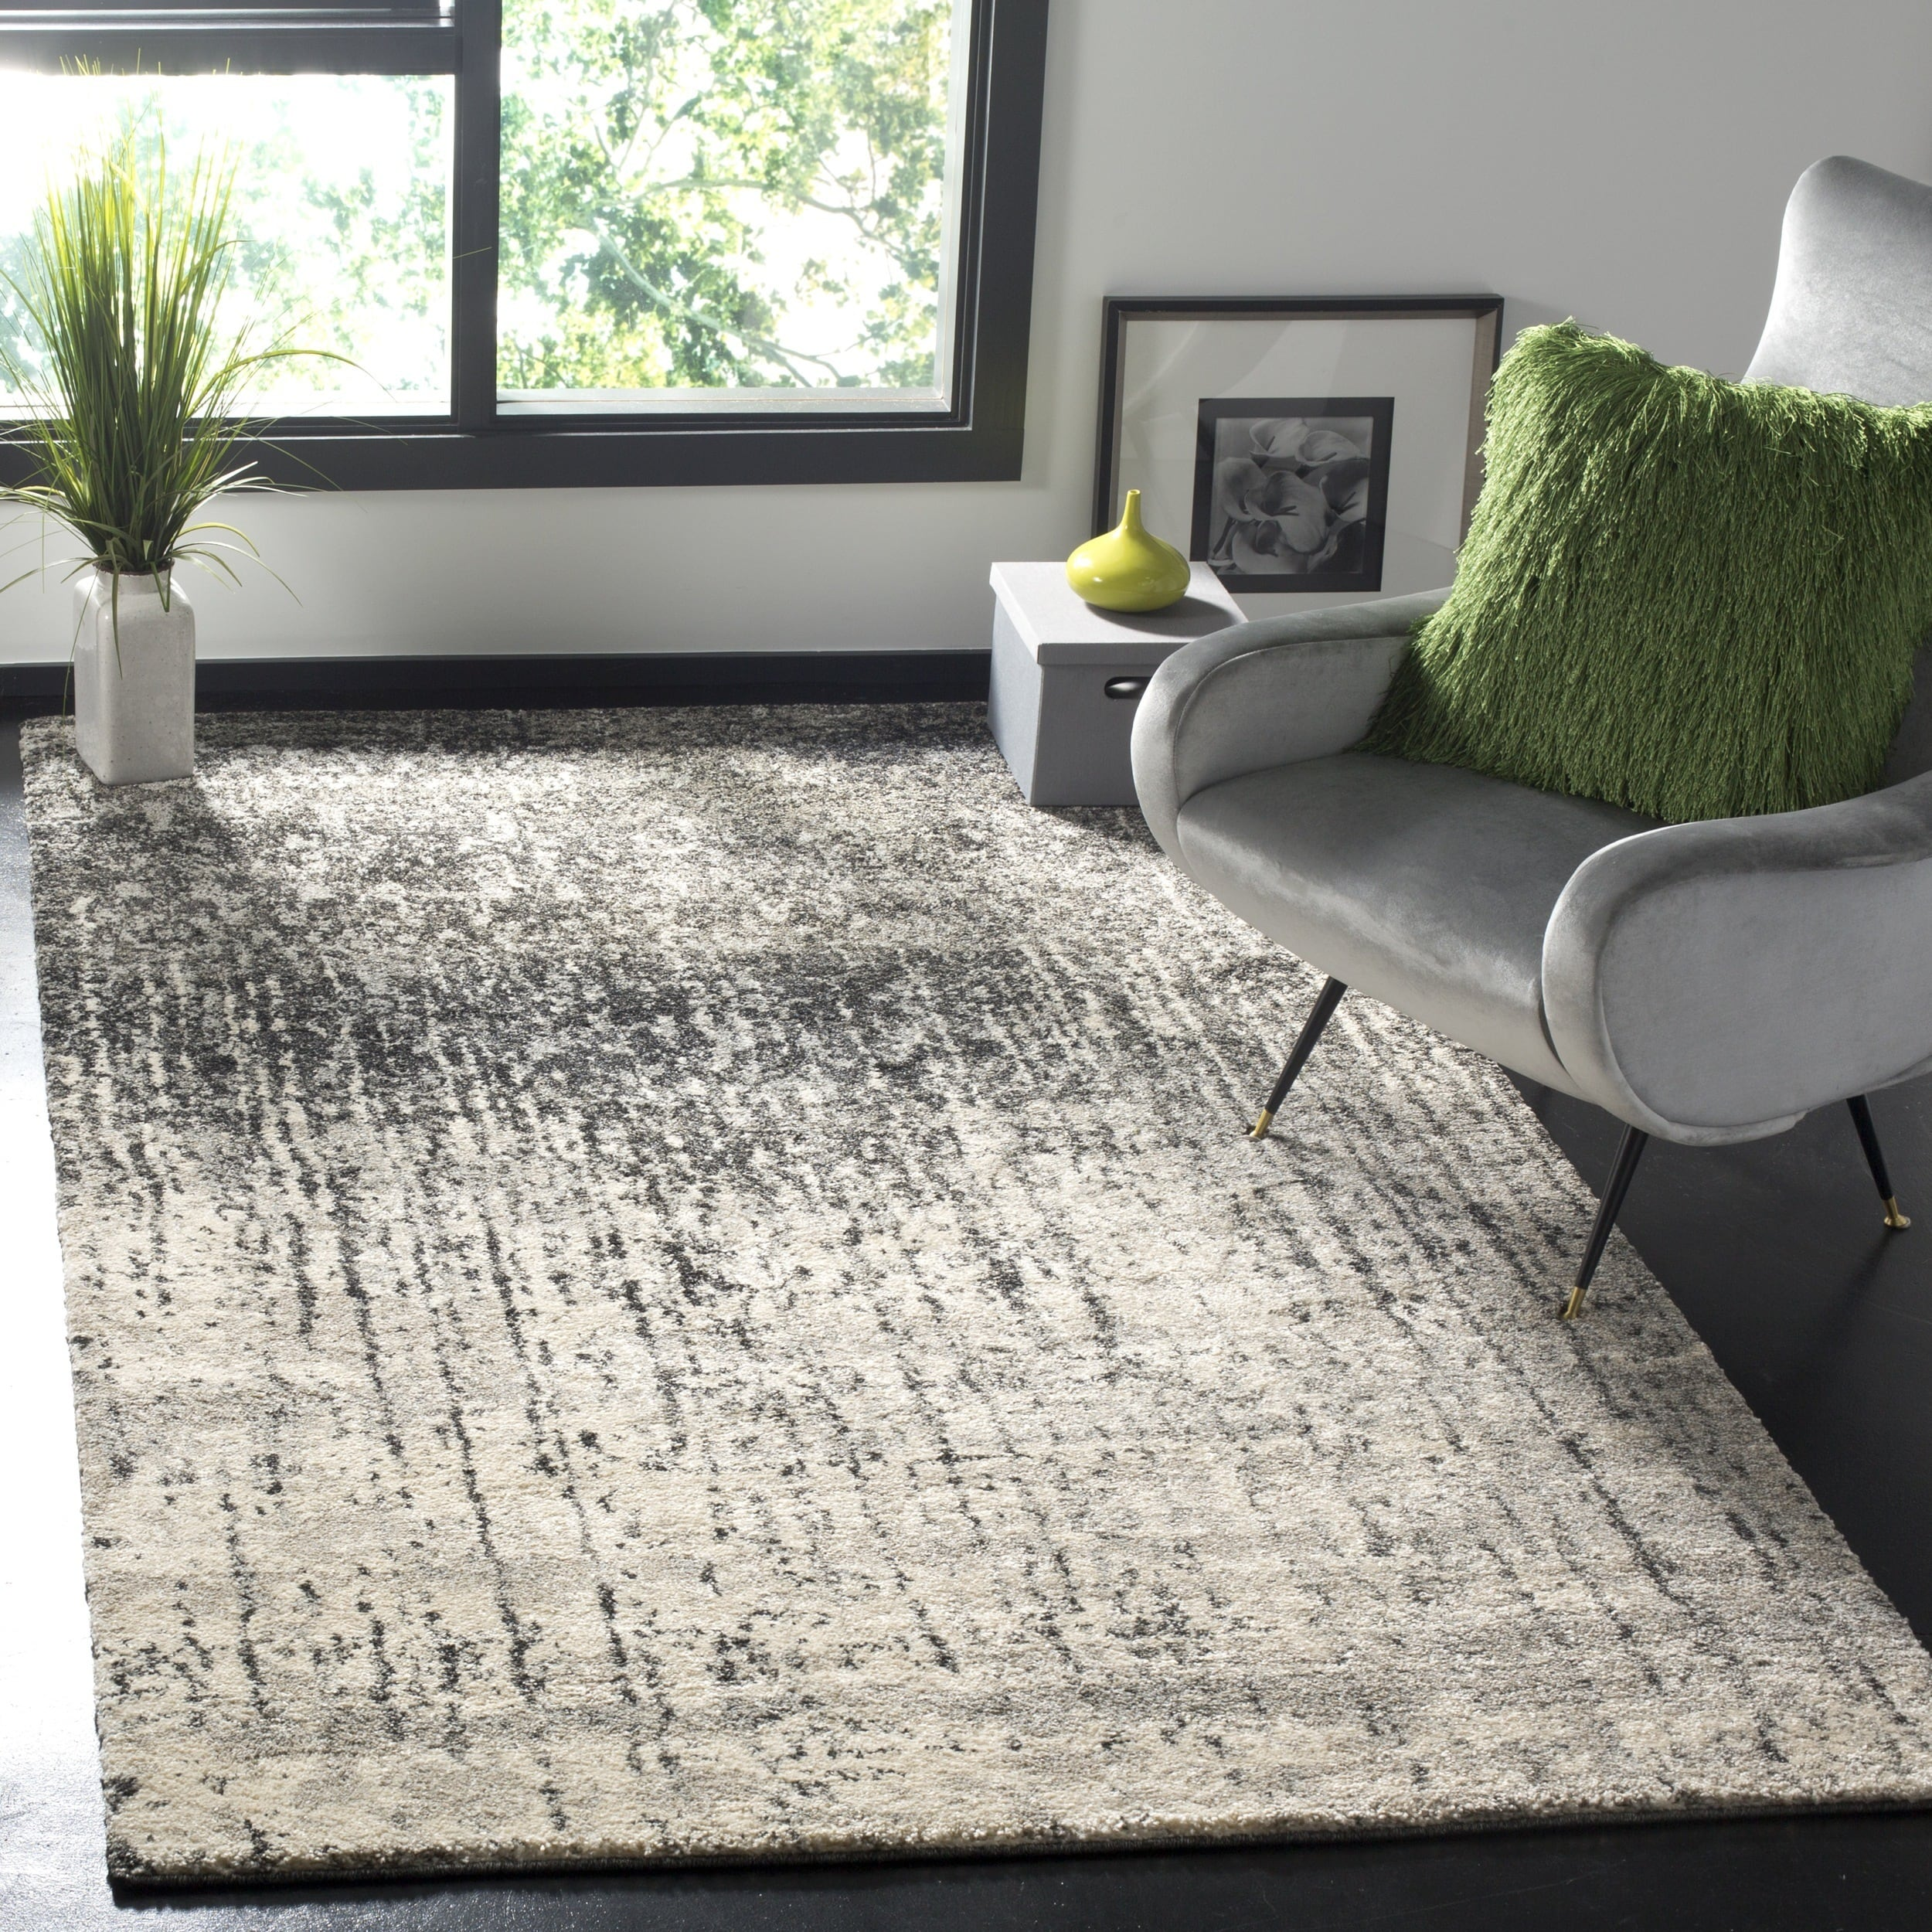 Safavieh retro mid century modern abstract black light grey distressed rug 8